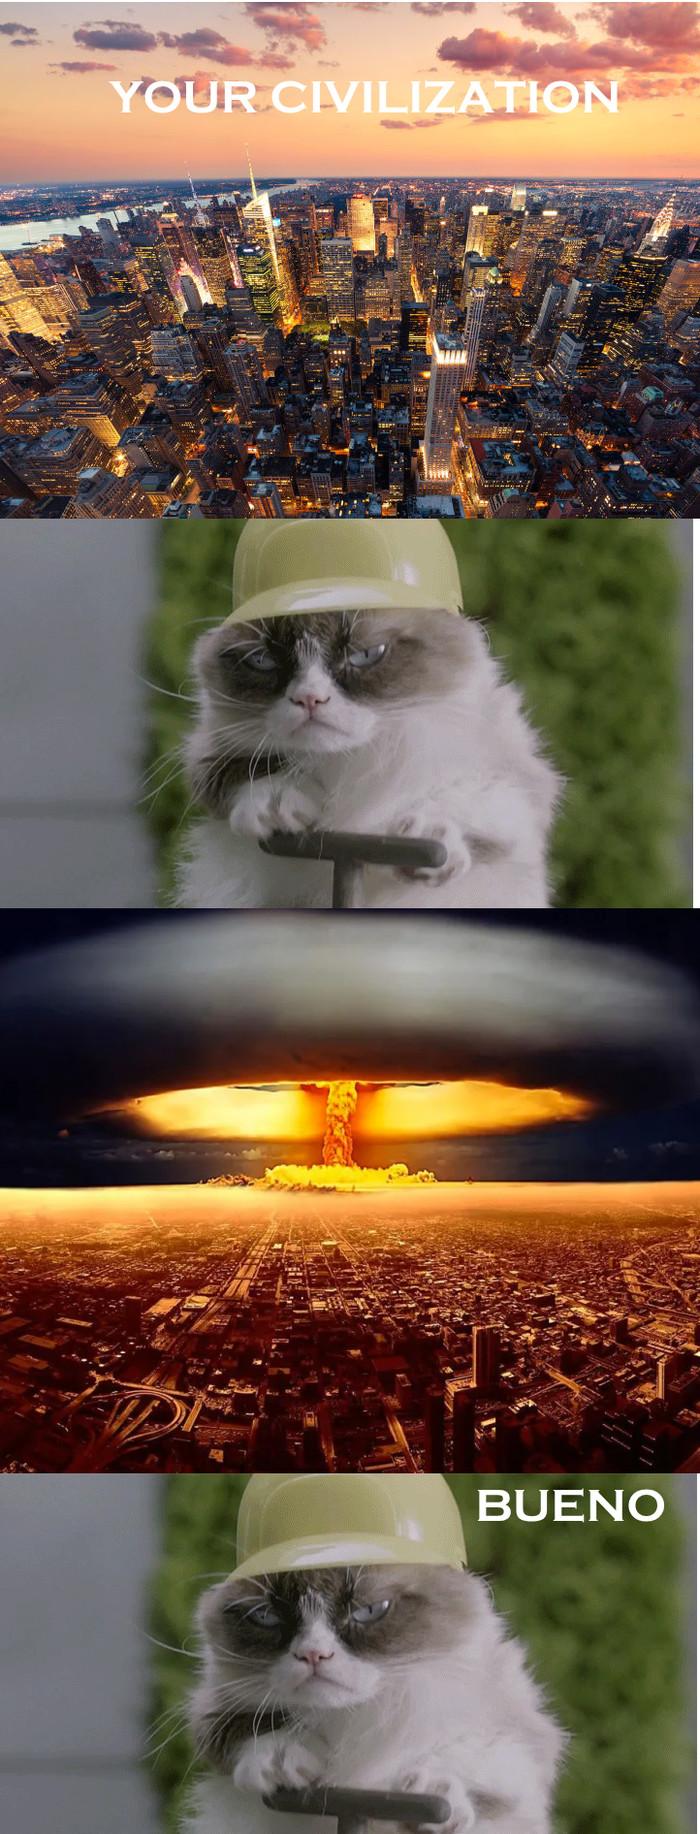 Bueno Cat Кот, Bueno, Длиннопост